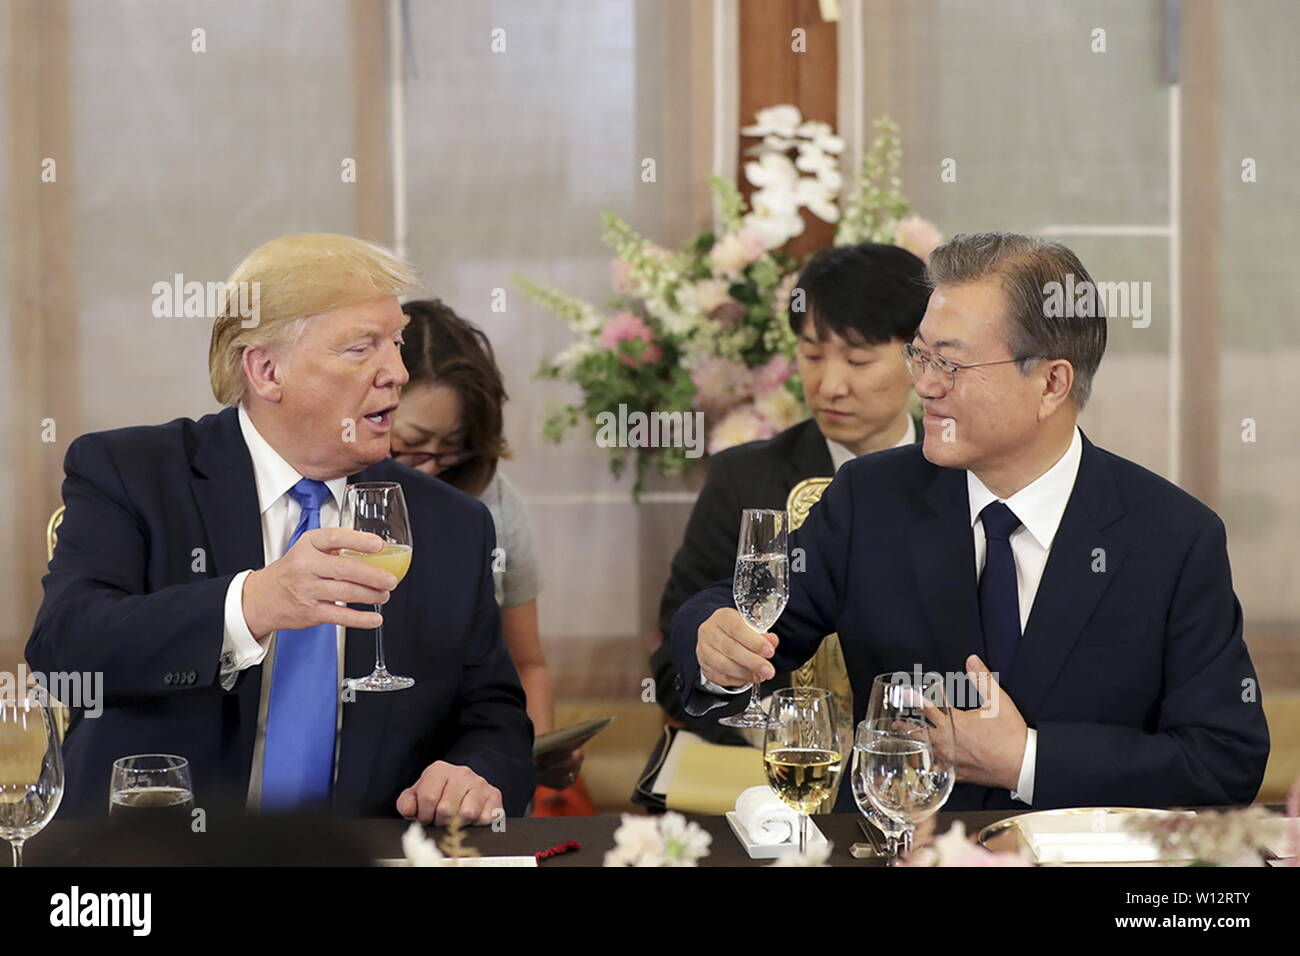 Seoul, South Korea  29th June, 2019  June 29, 2019-Osan